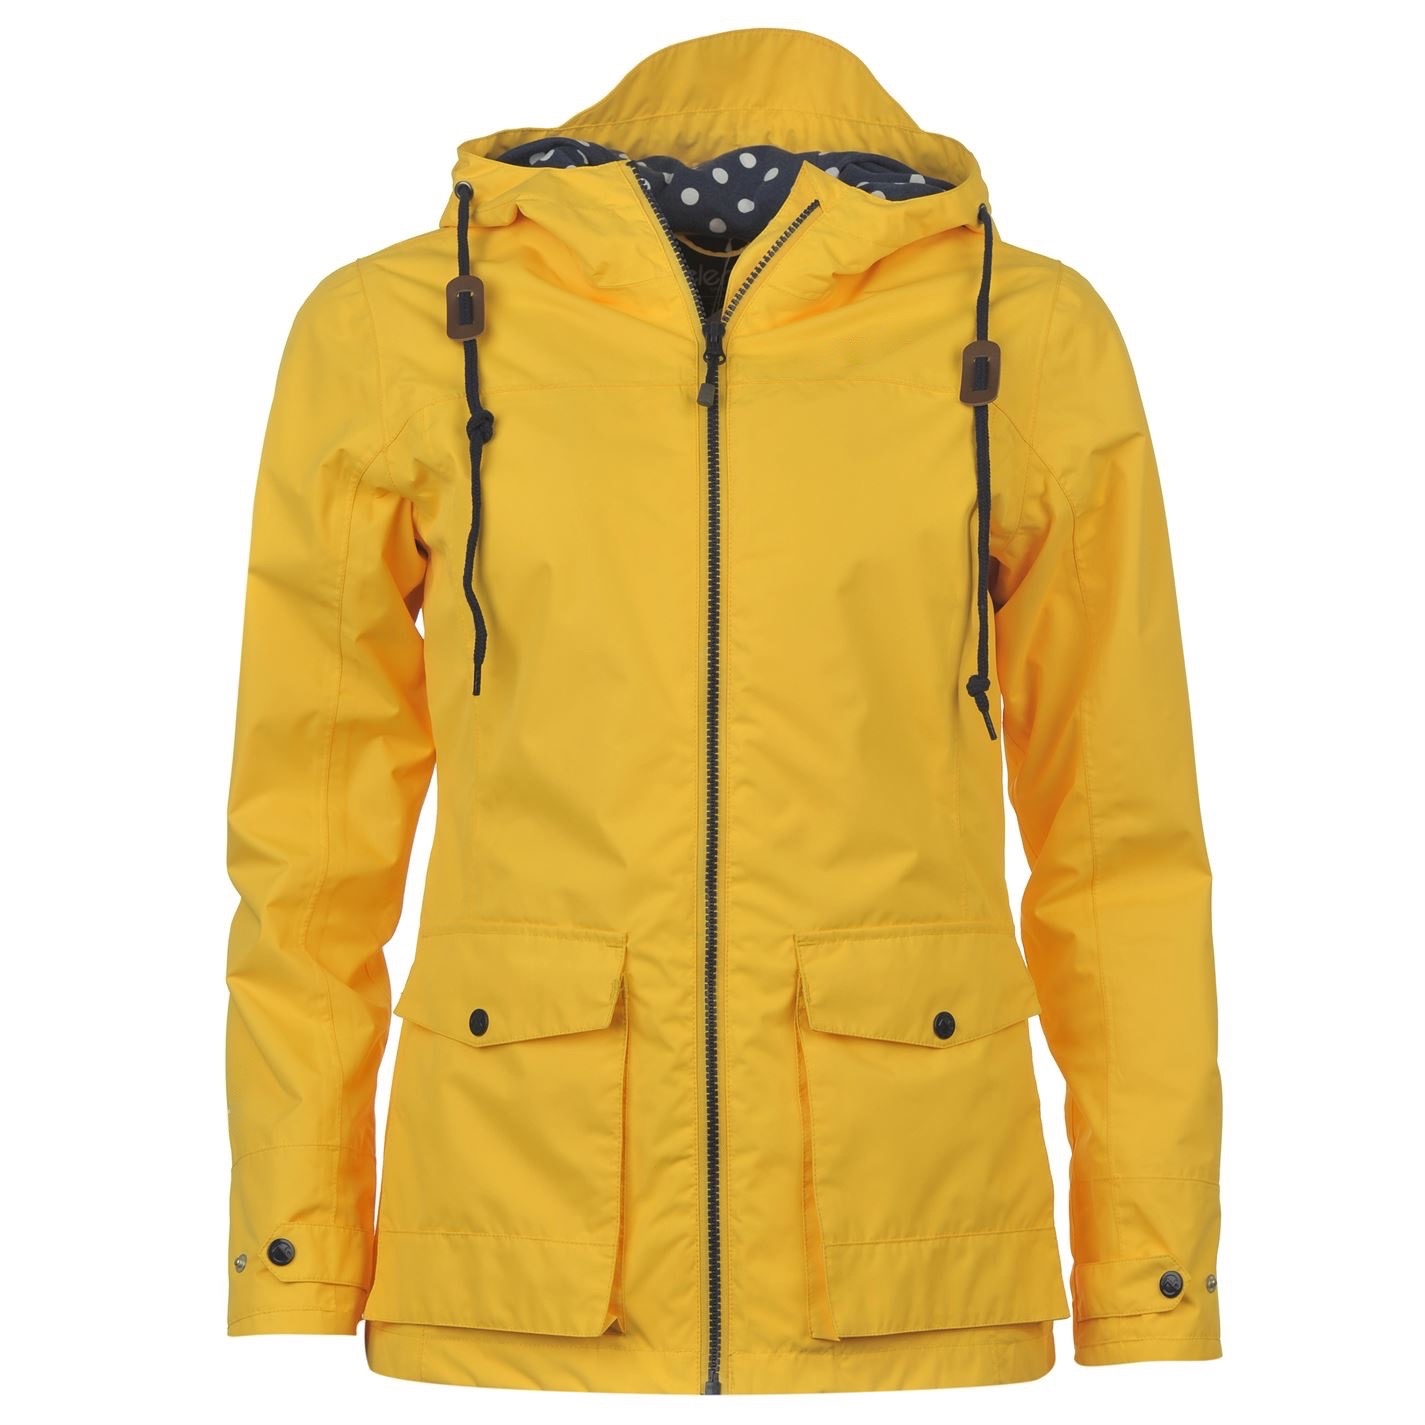 How to Wear Ladies Waterproof Jackets Fashionably